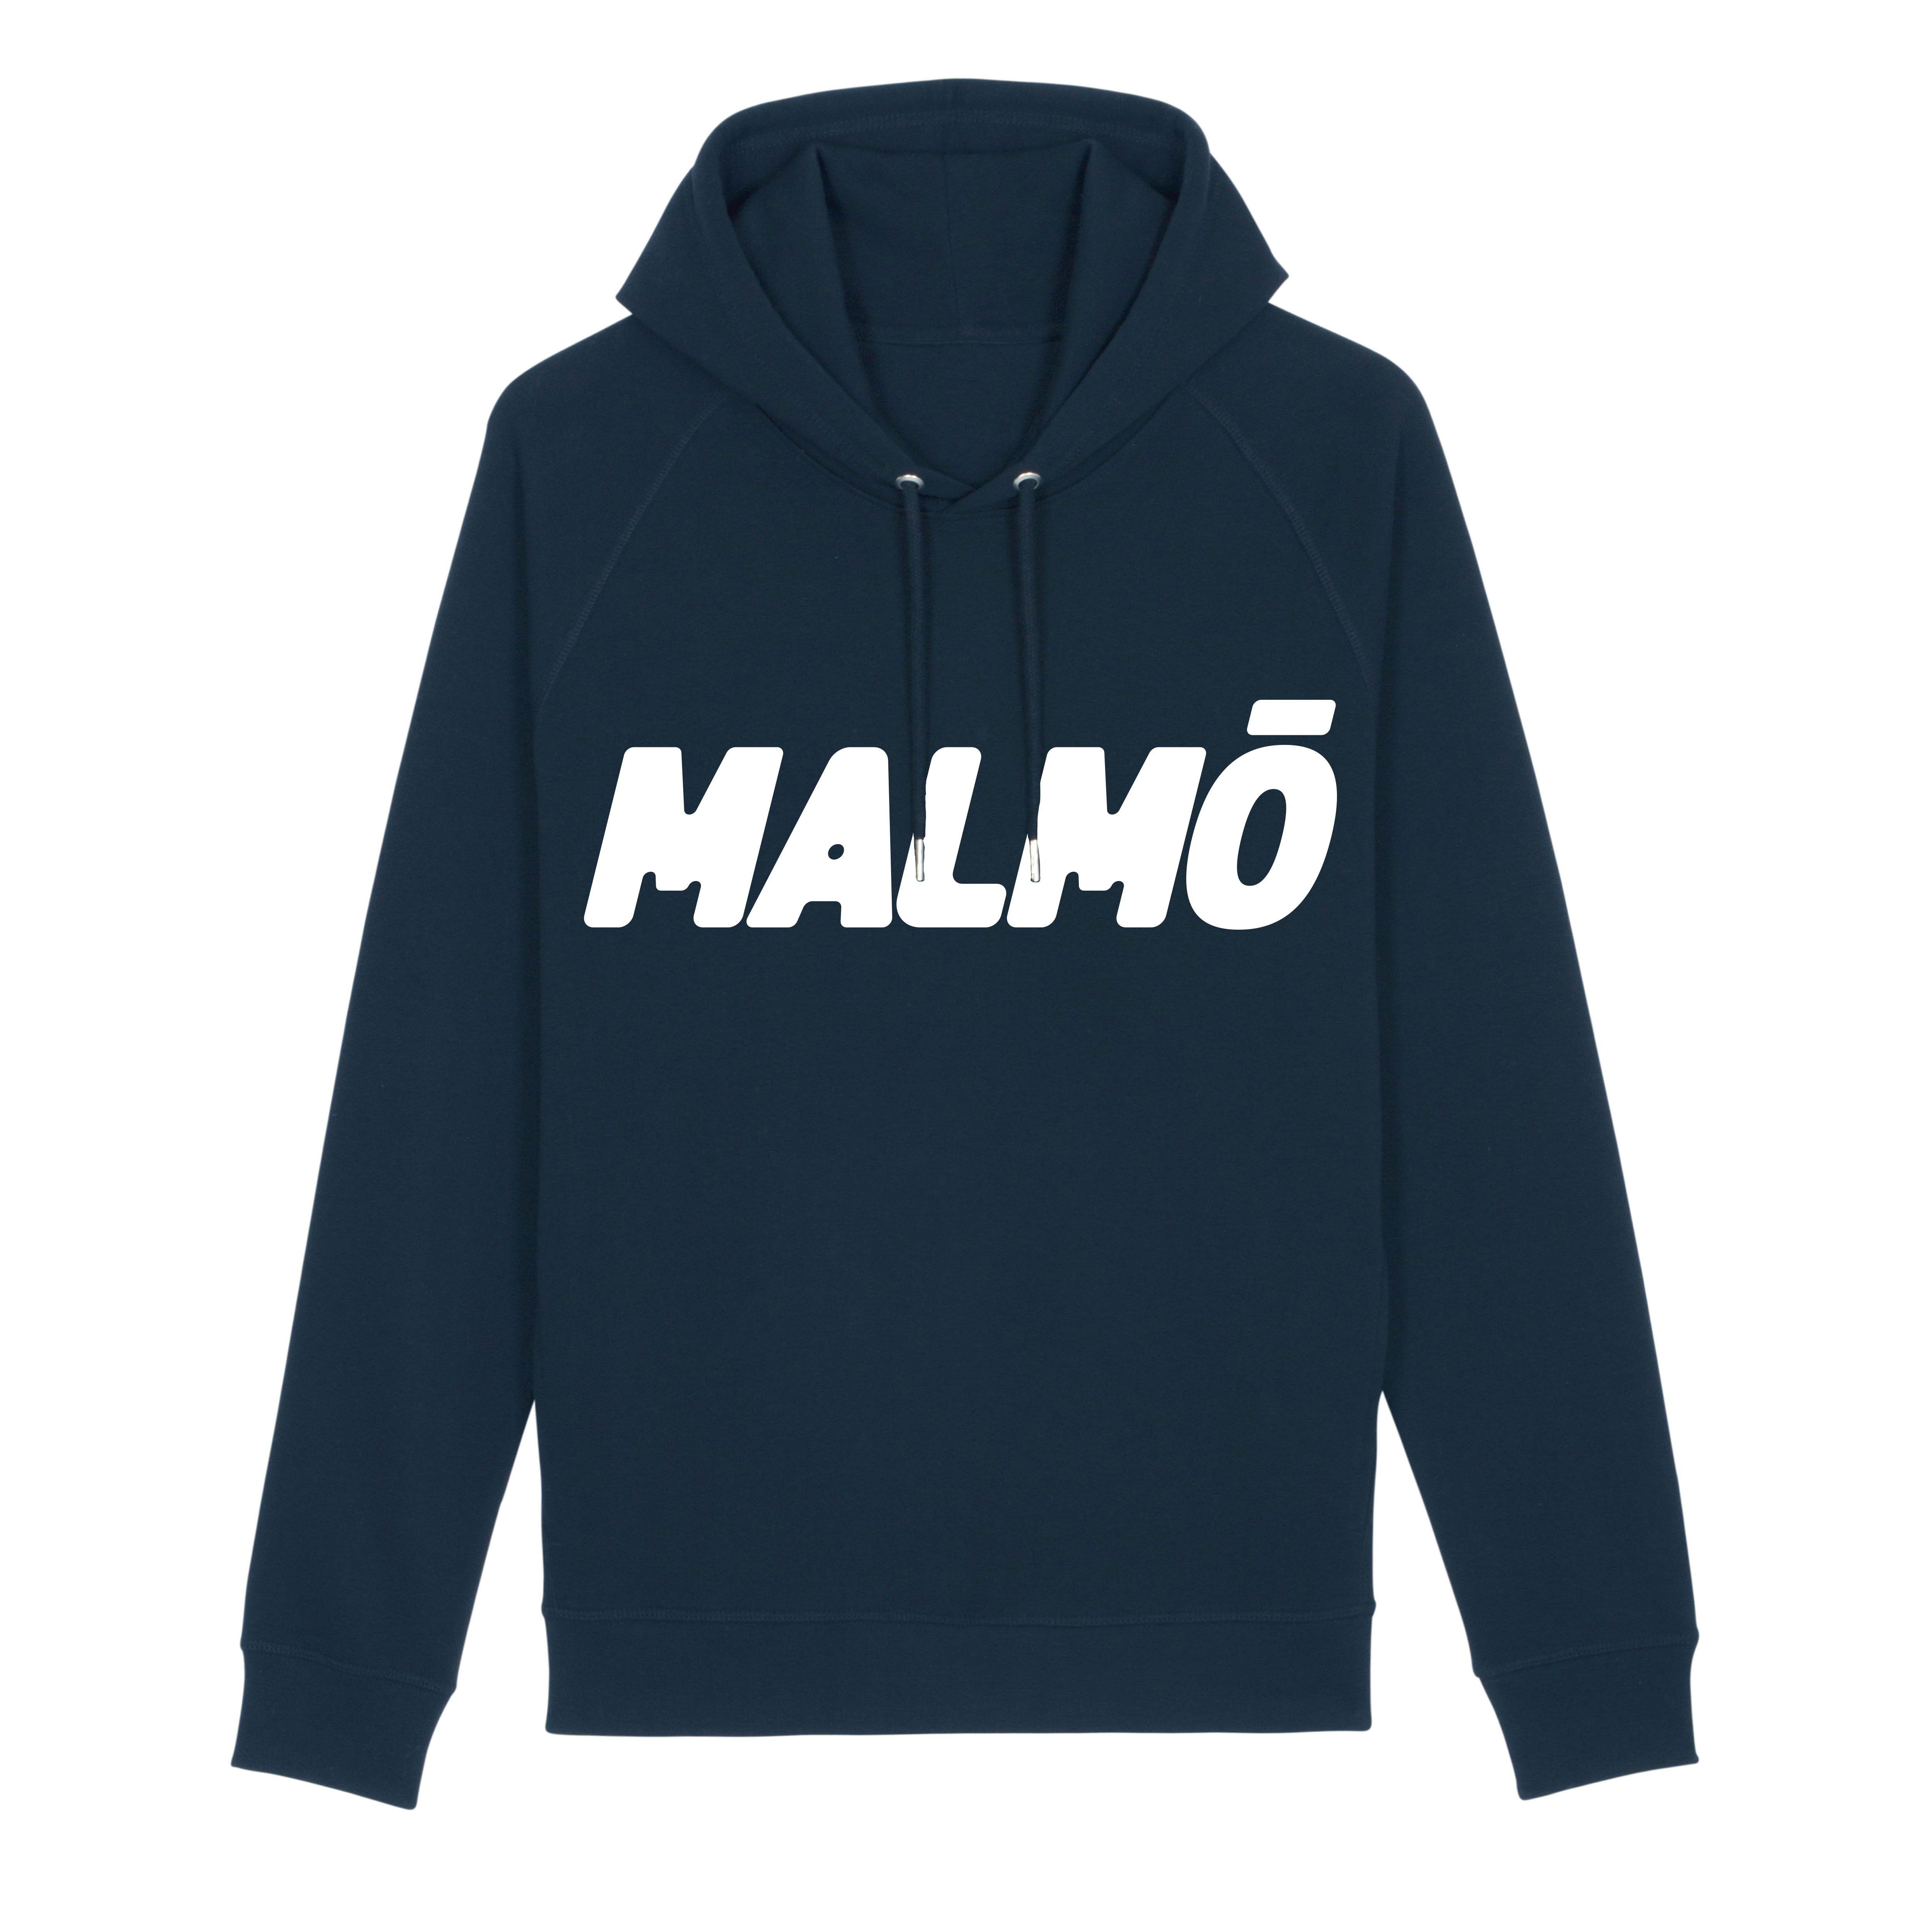 MALMÖ - Hoodie Navy